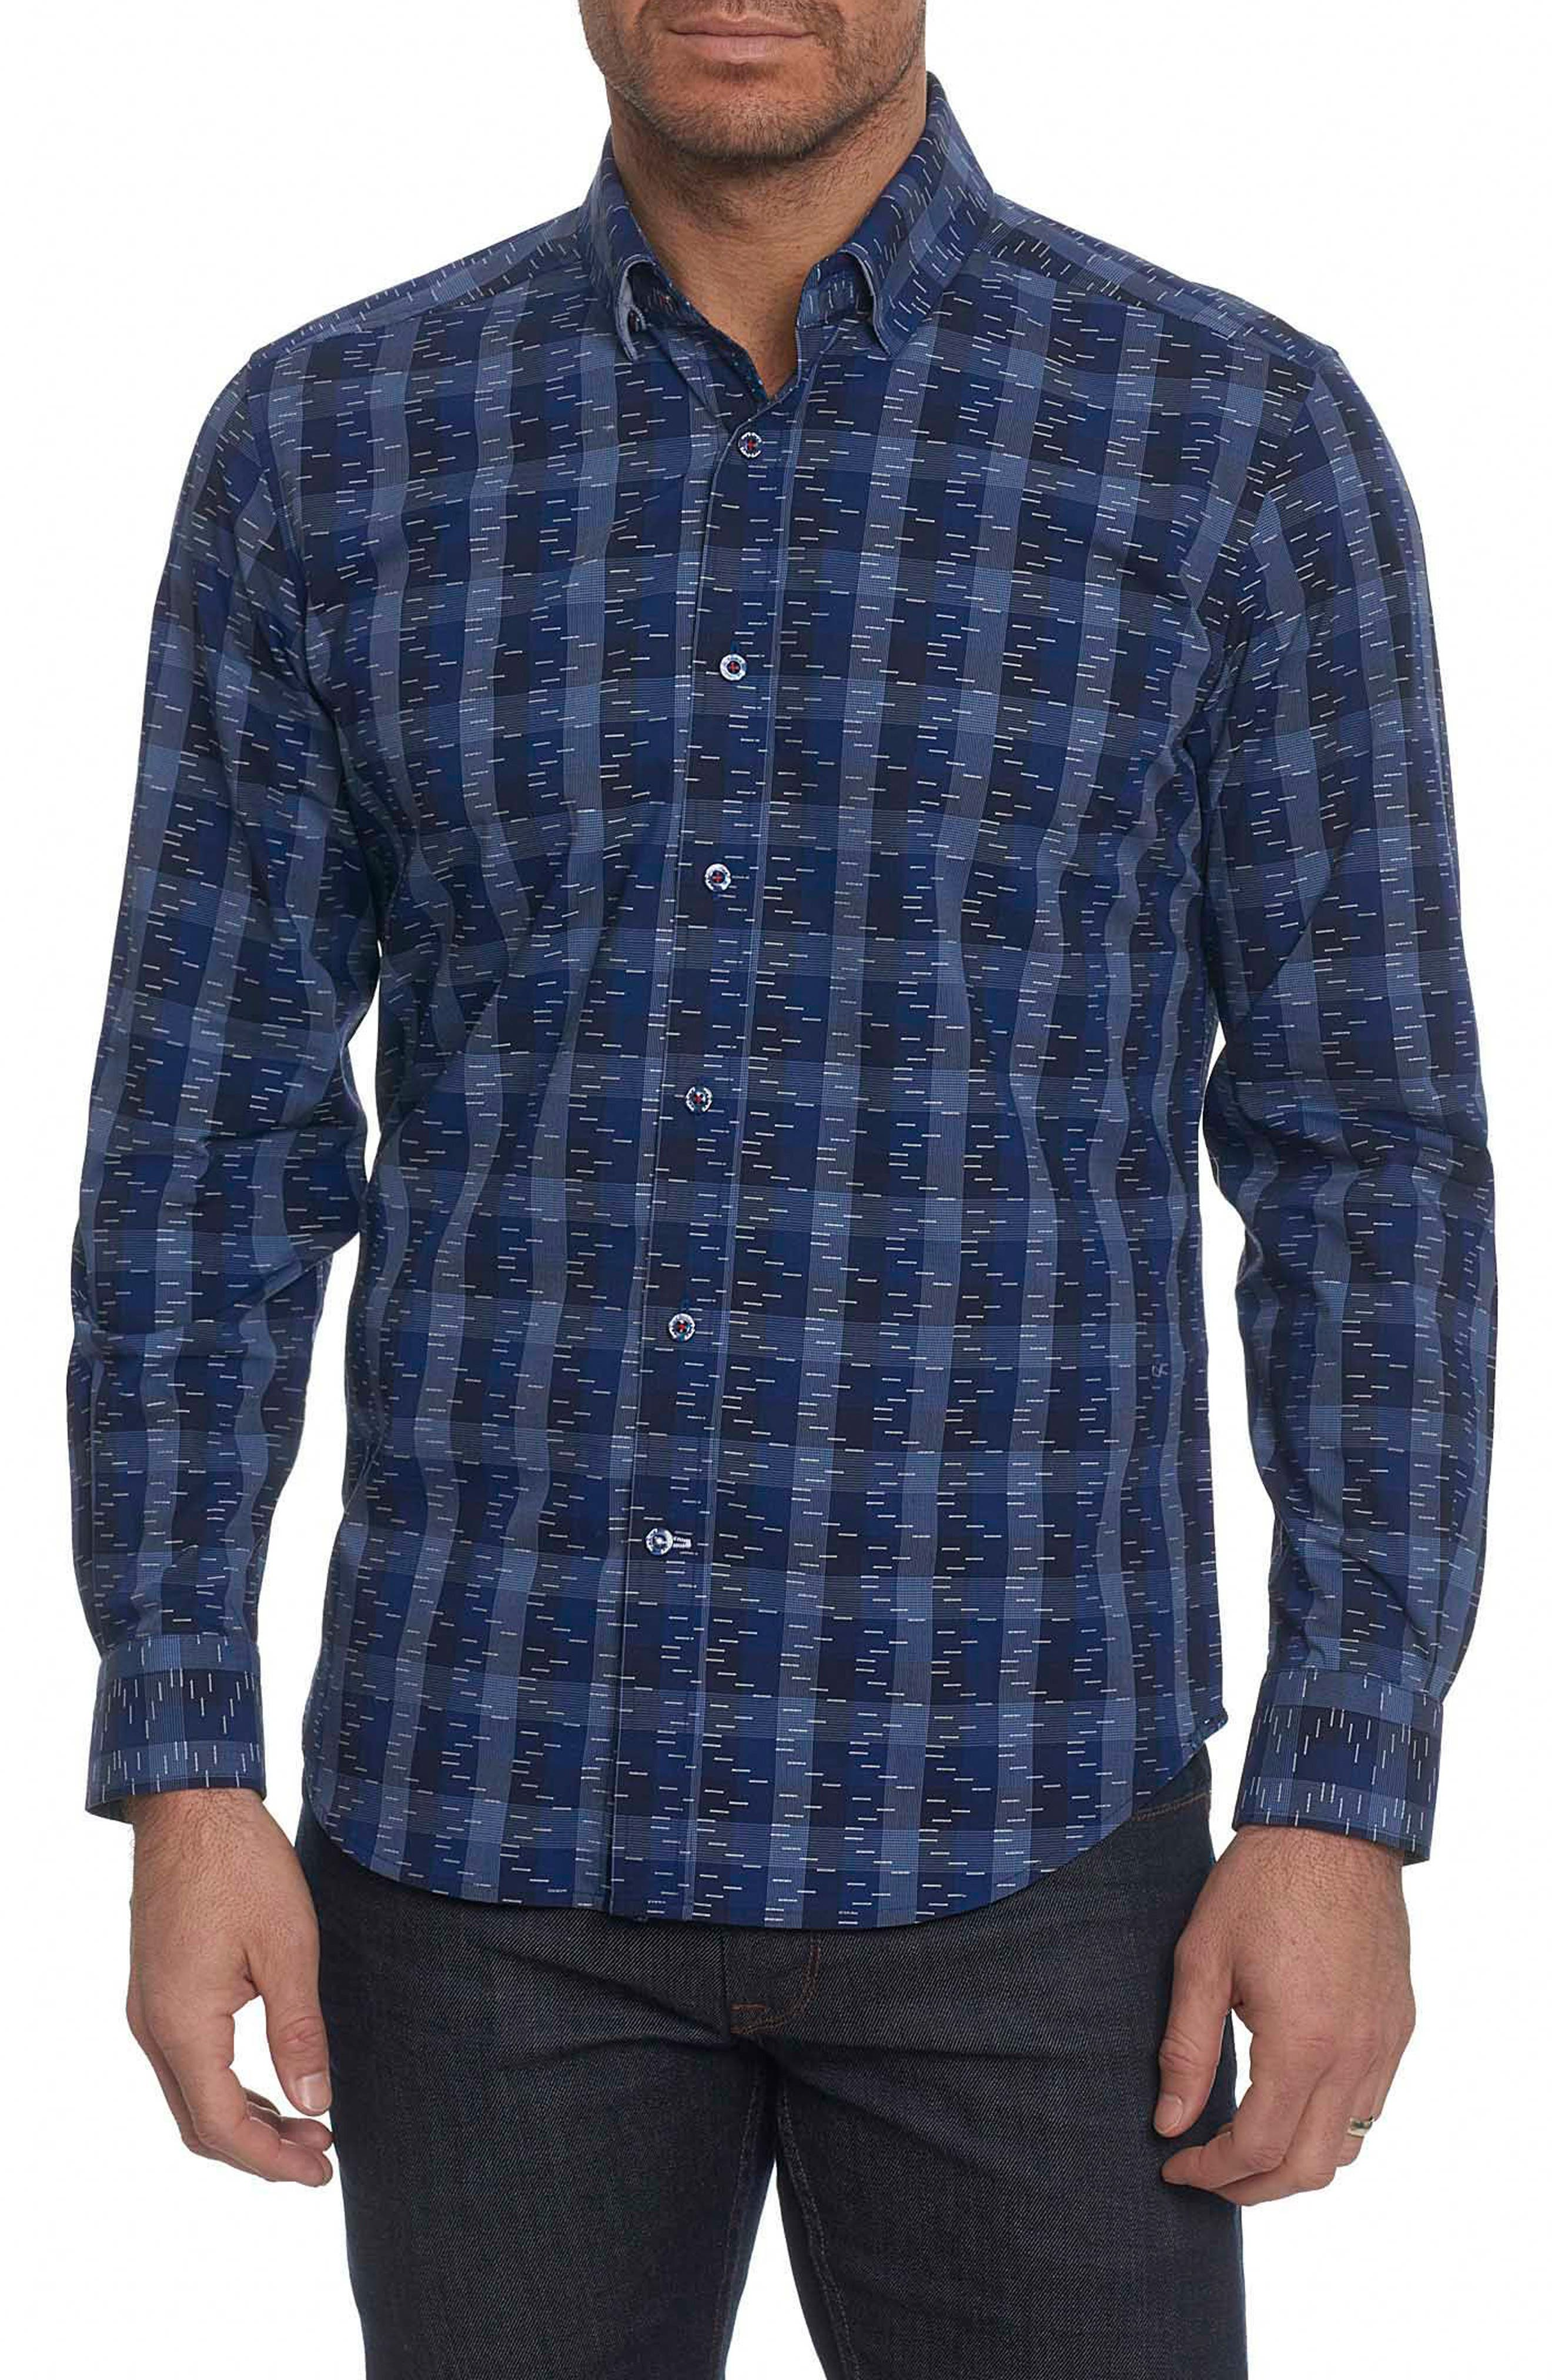 Alternate Image 1 Selected - Robert Graham Levy Regular Fit Print Sport Shirt